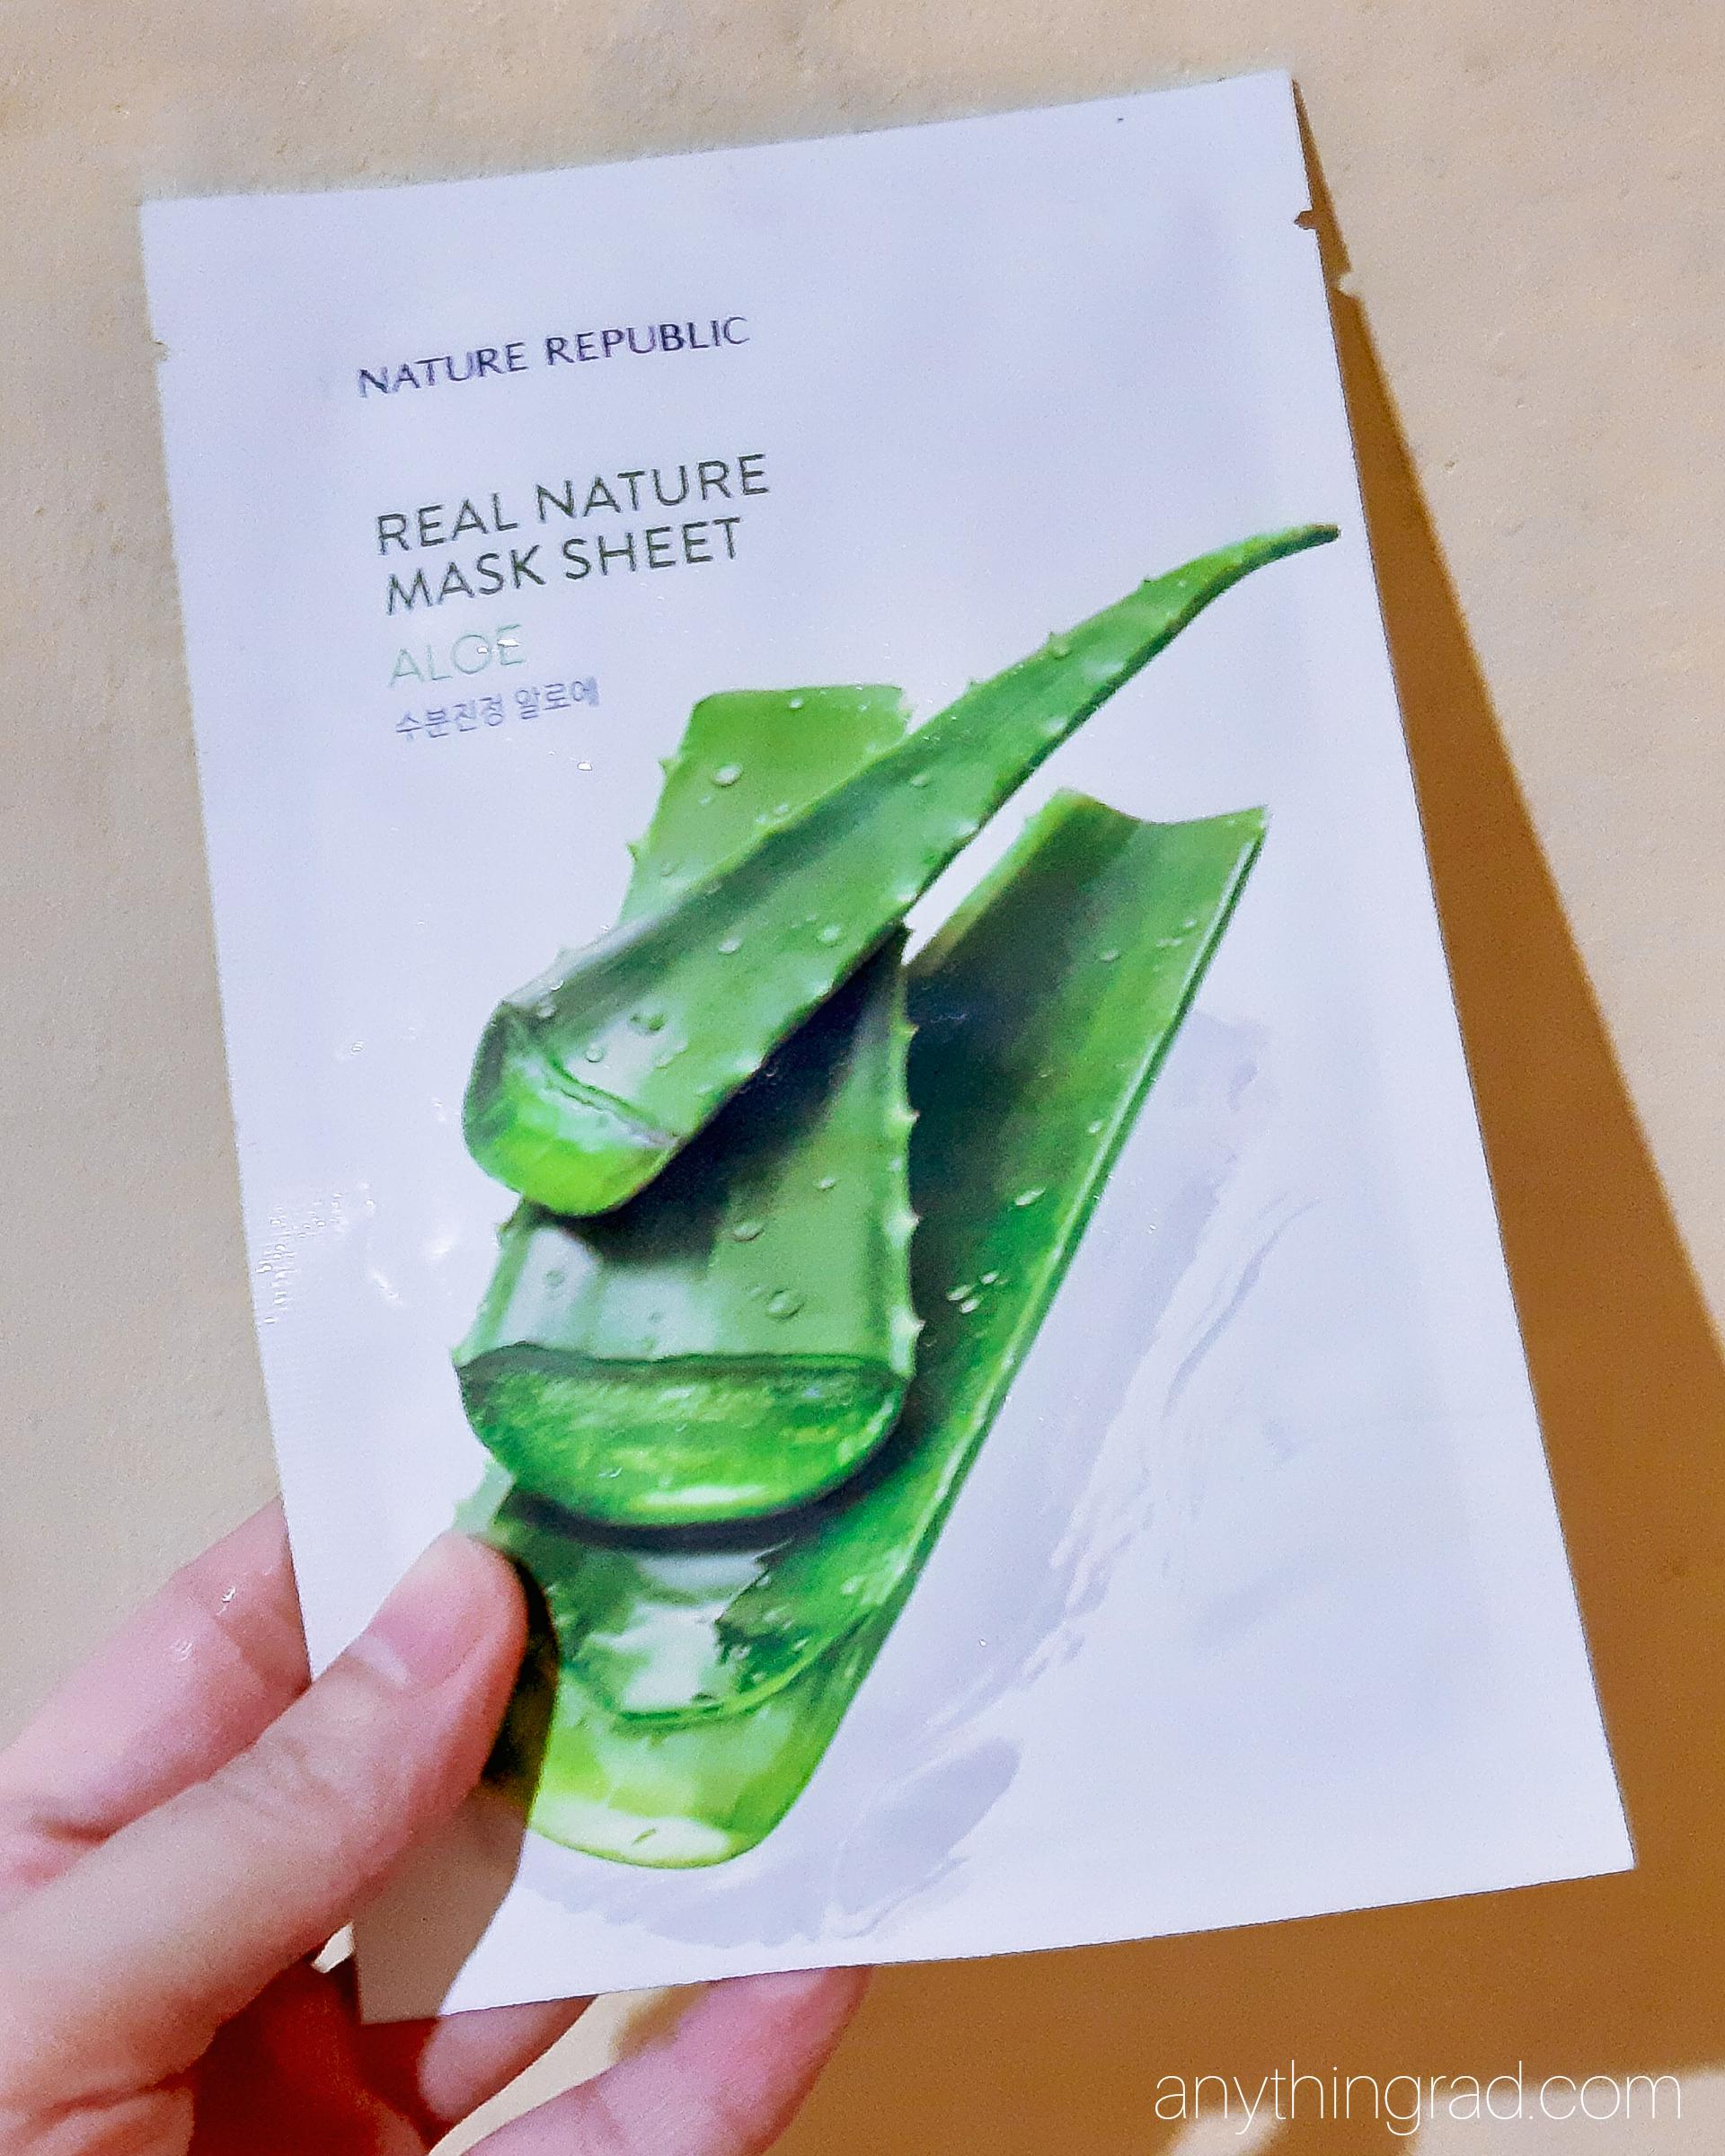 Aloe Vera MAsk Sheet by Nature Republic